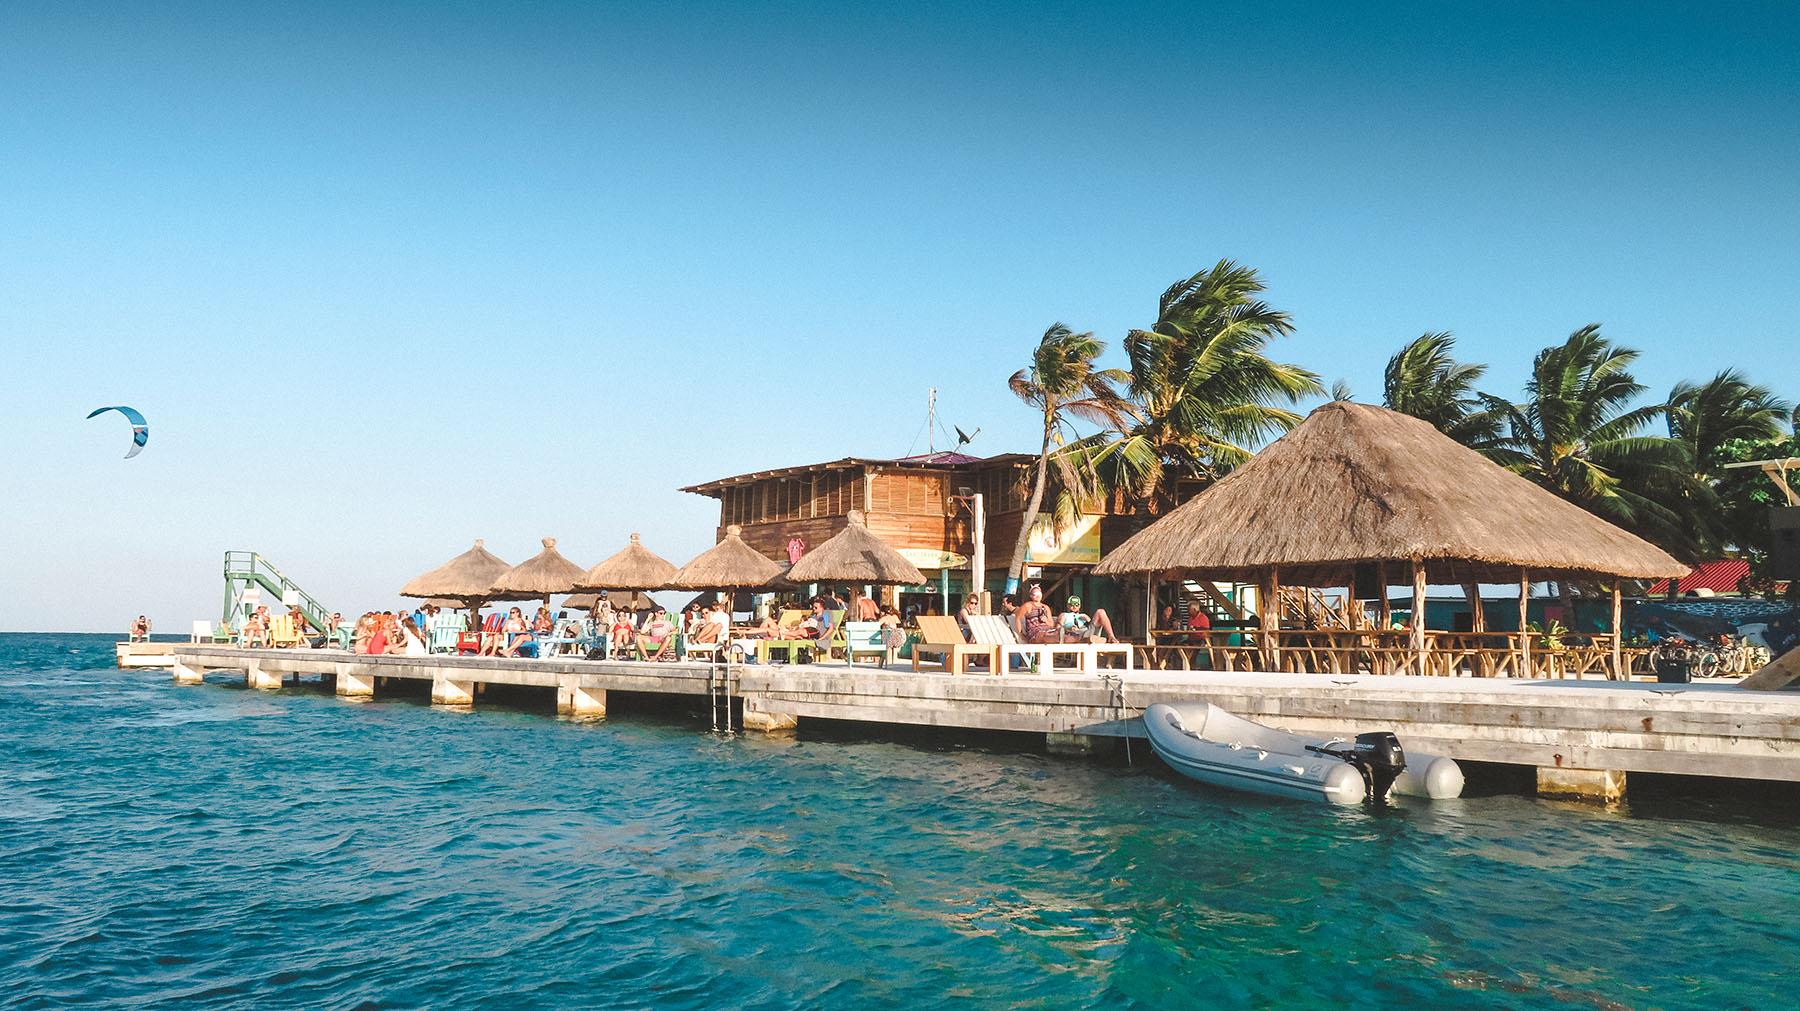 Belize Ausflug Caye Caulker Speedboot